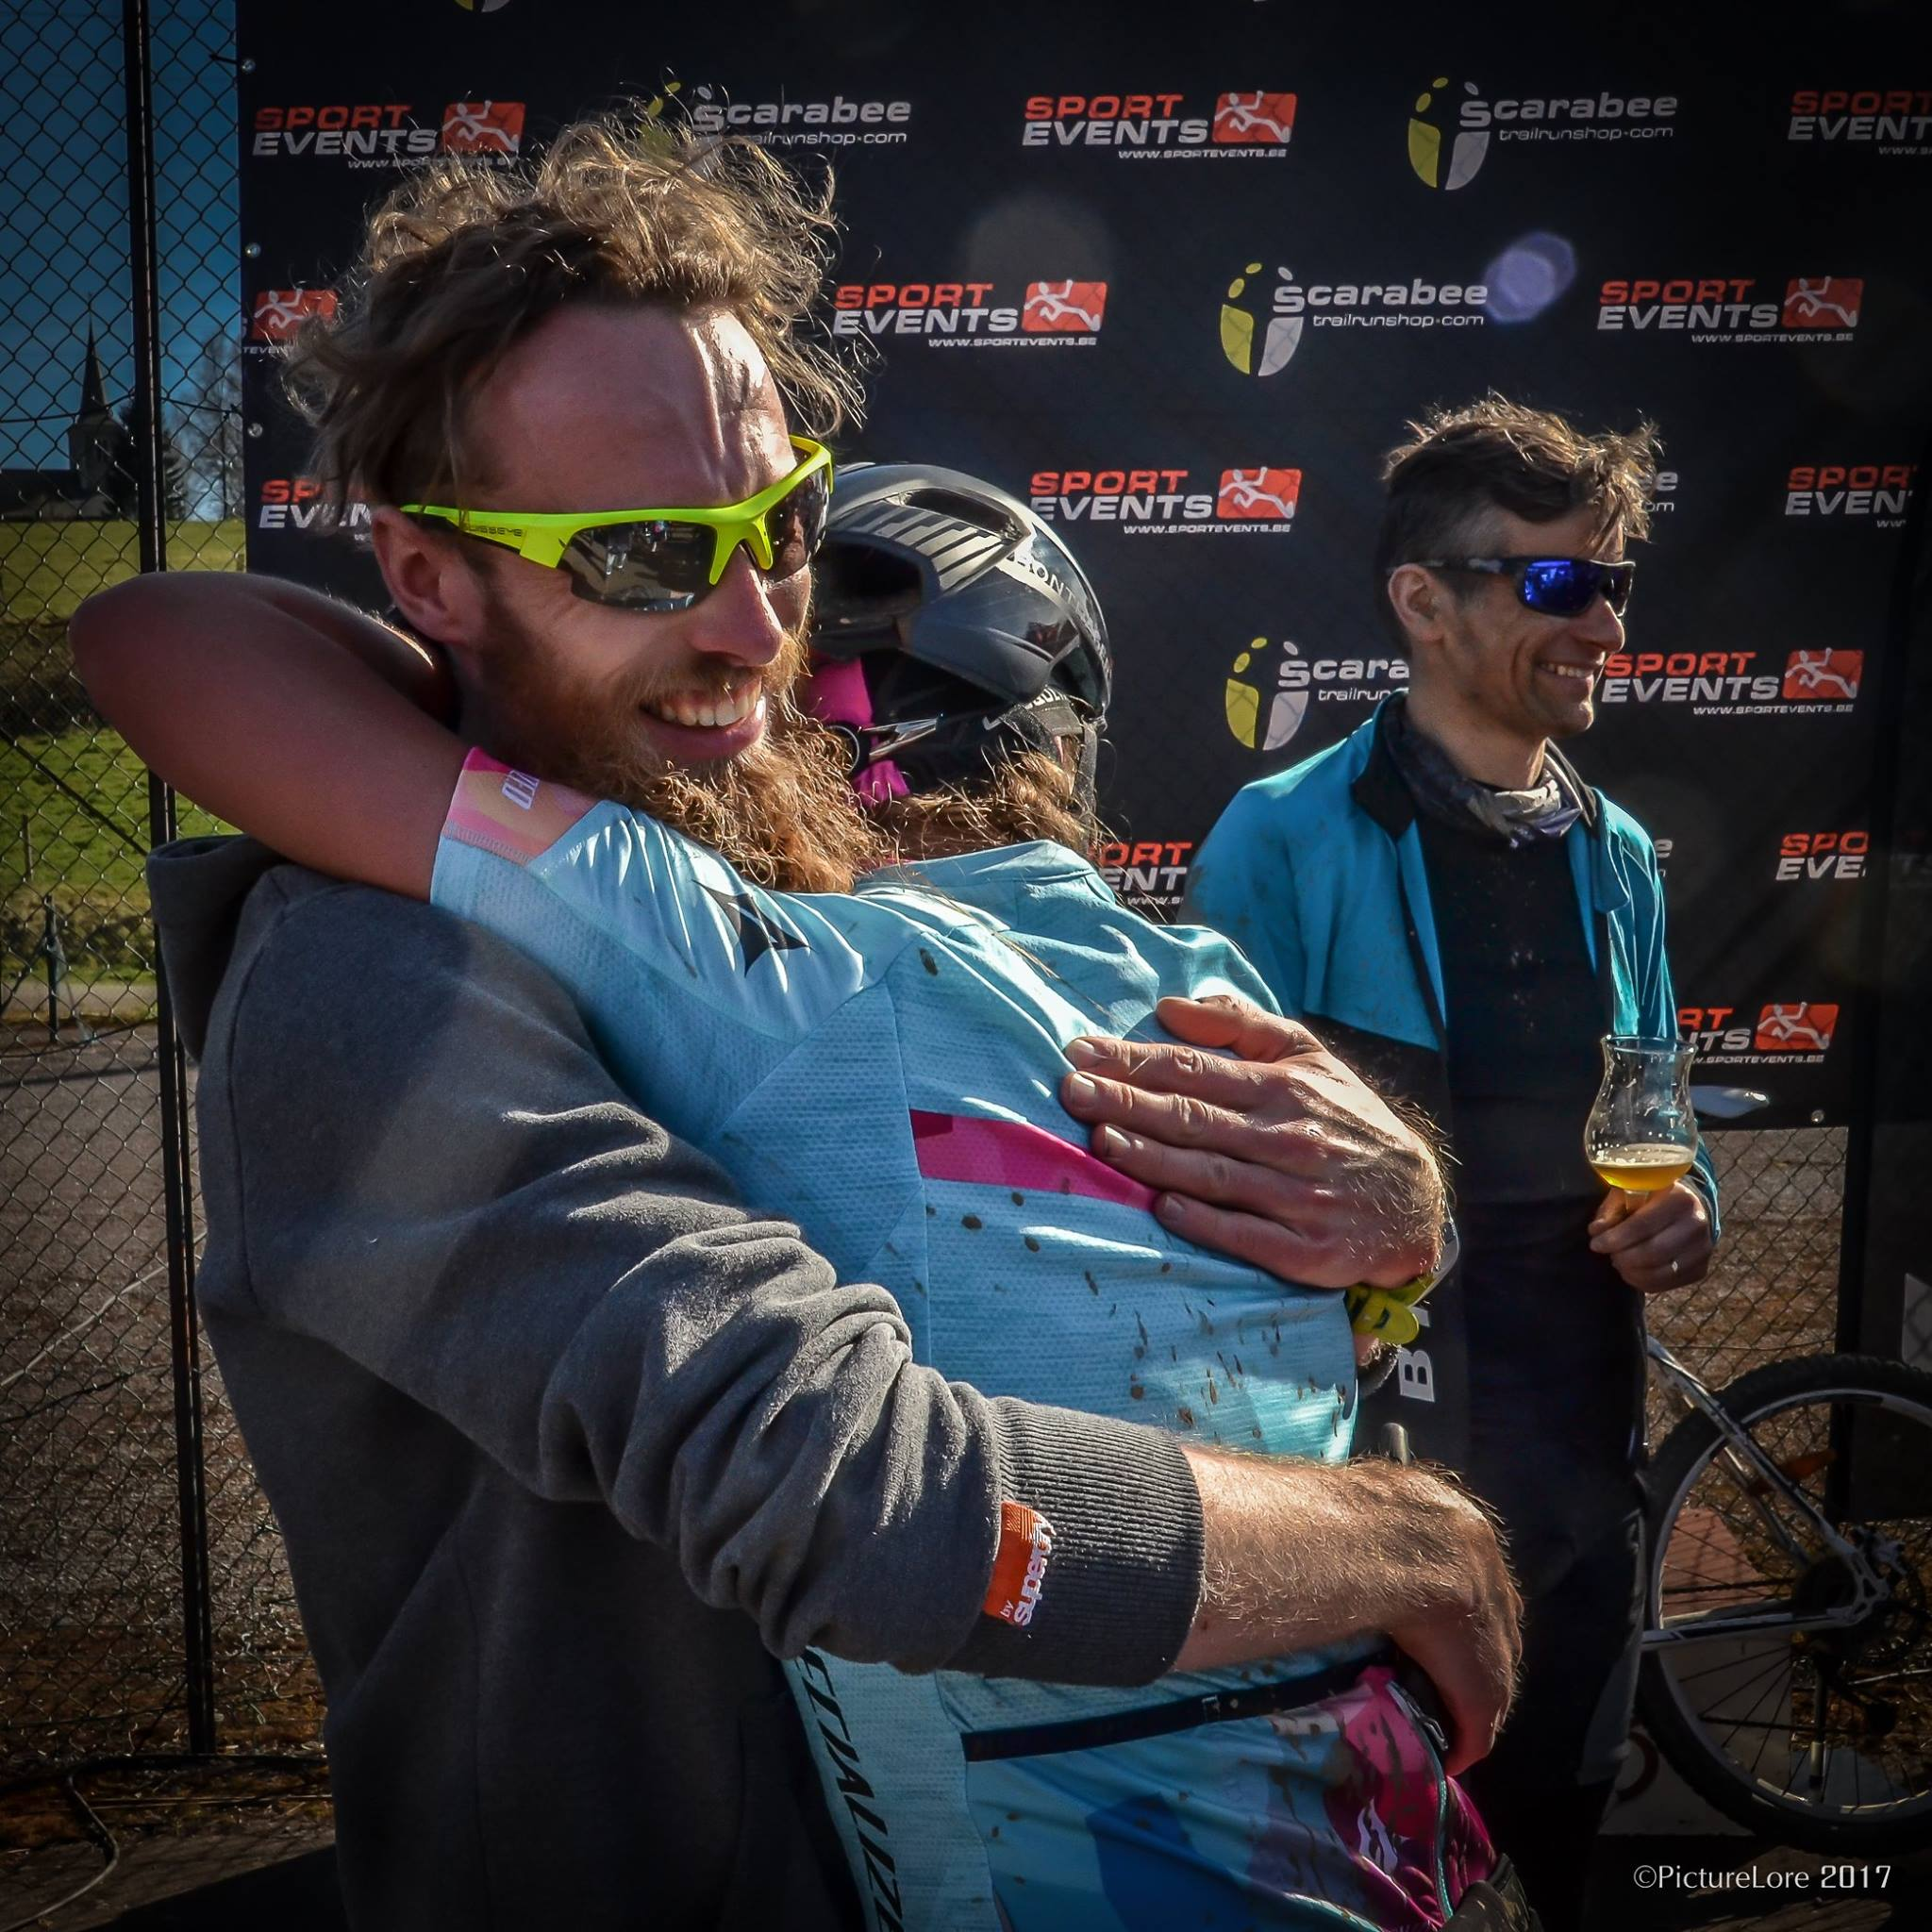 Rebecca die Tom in de armen valt in plaats van andersom (foto: Lore Vanbetsbrugge)